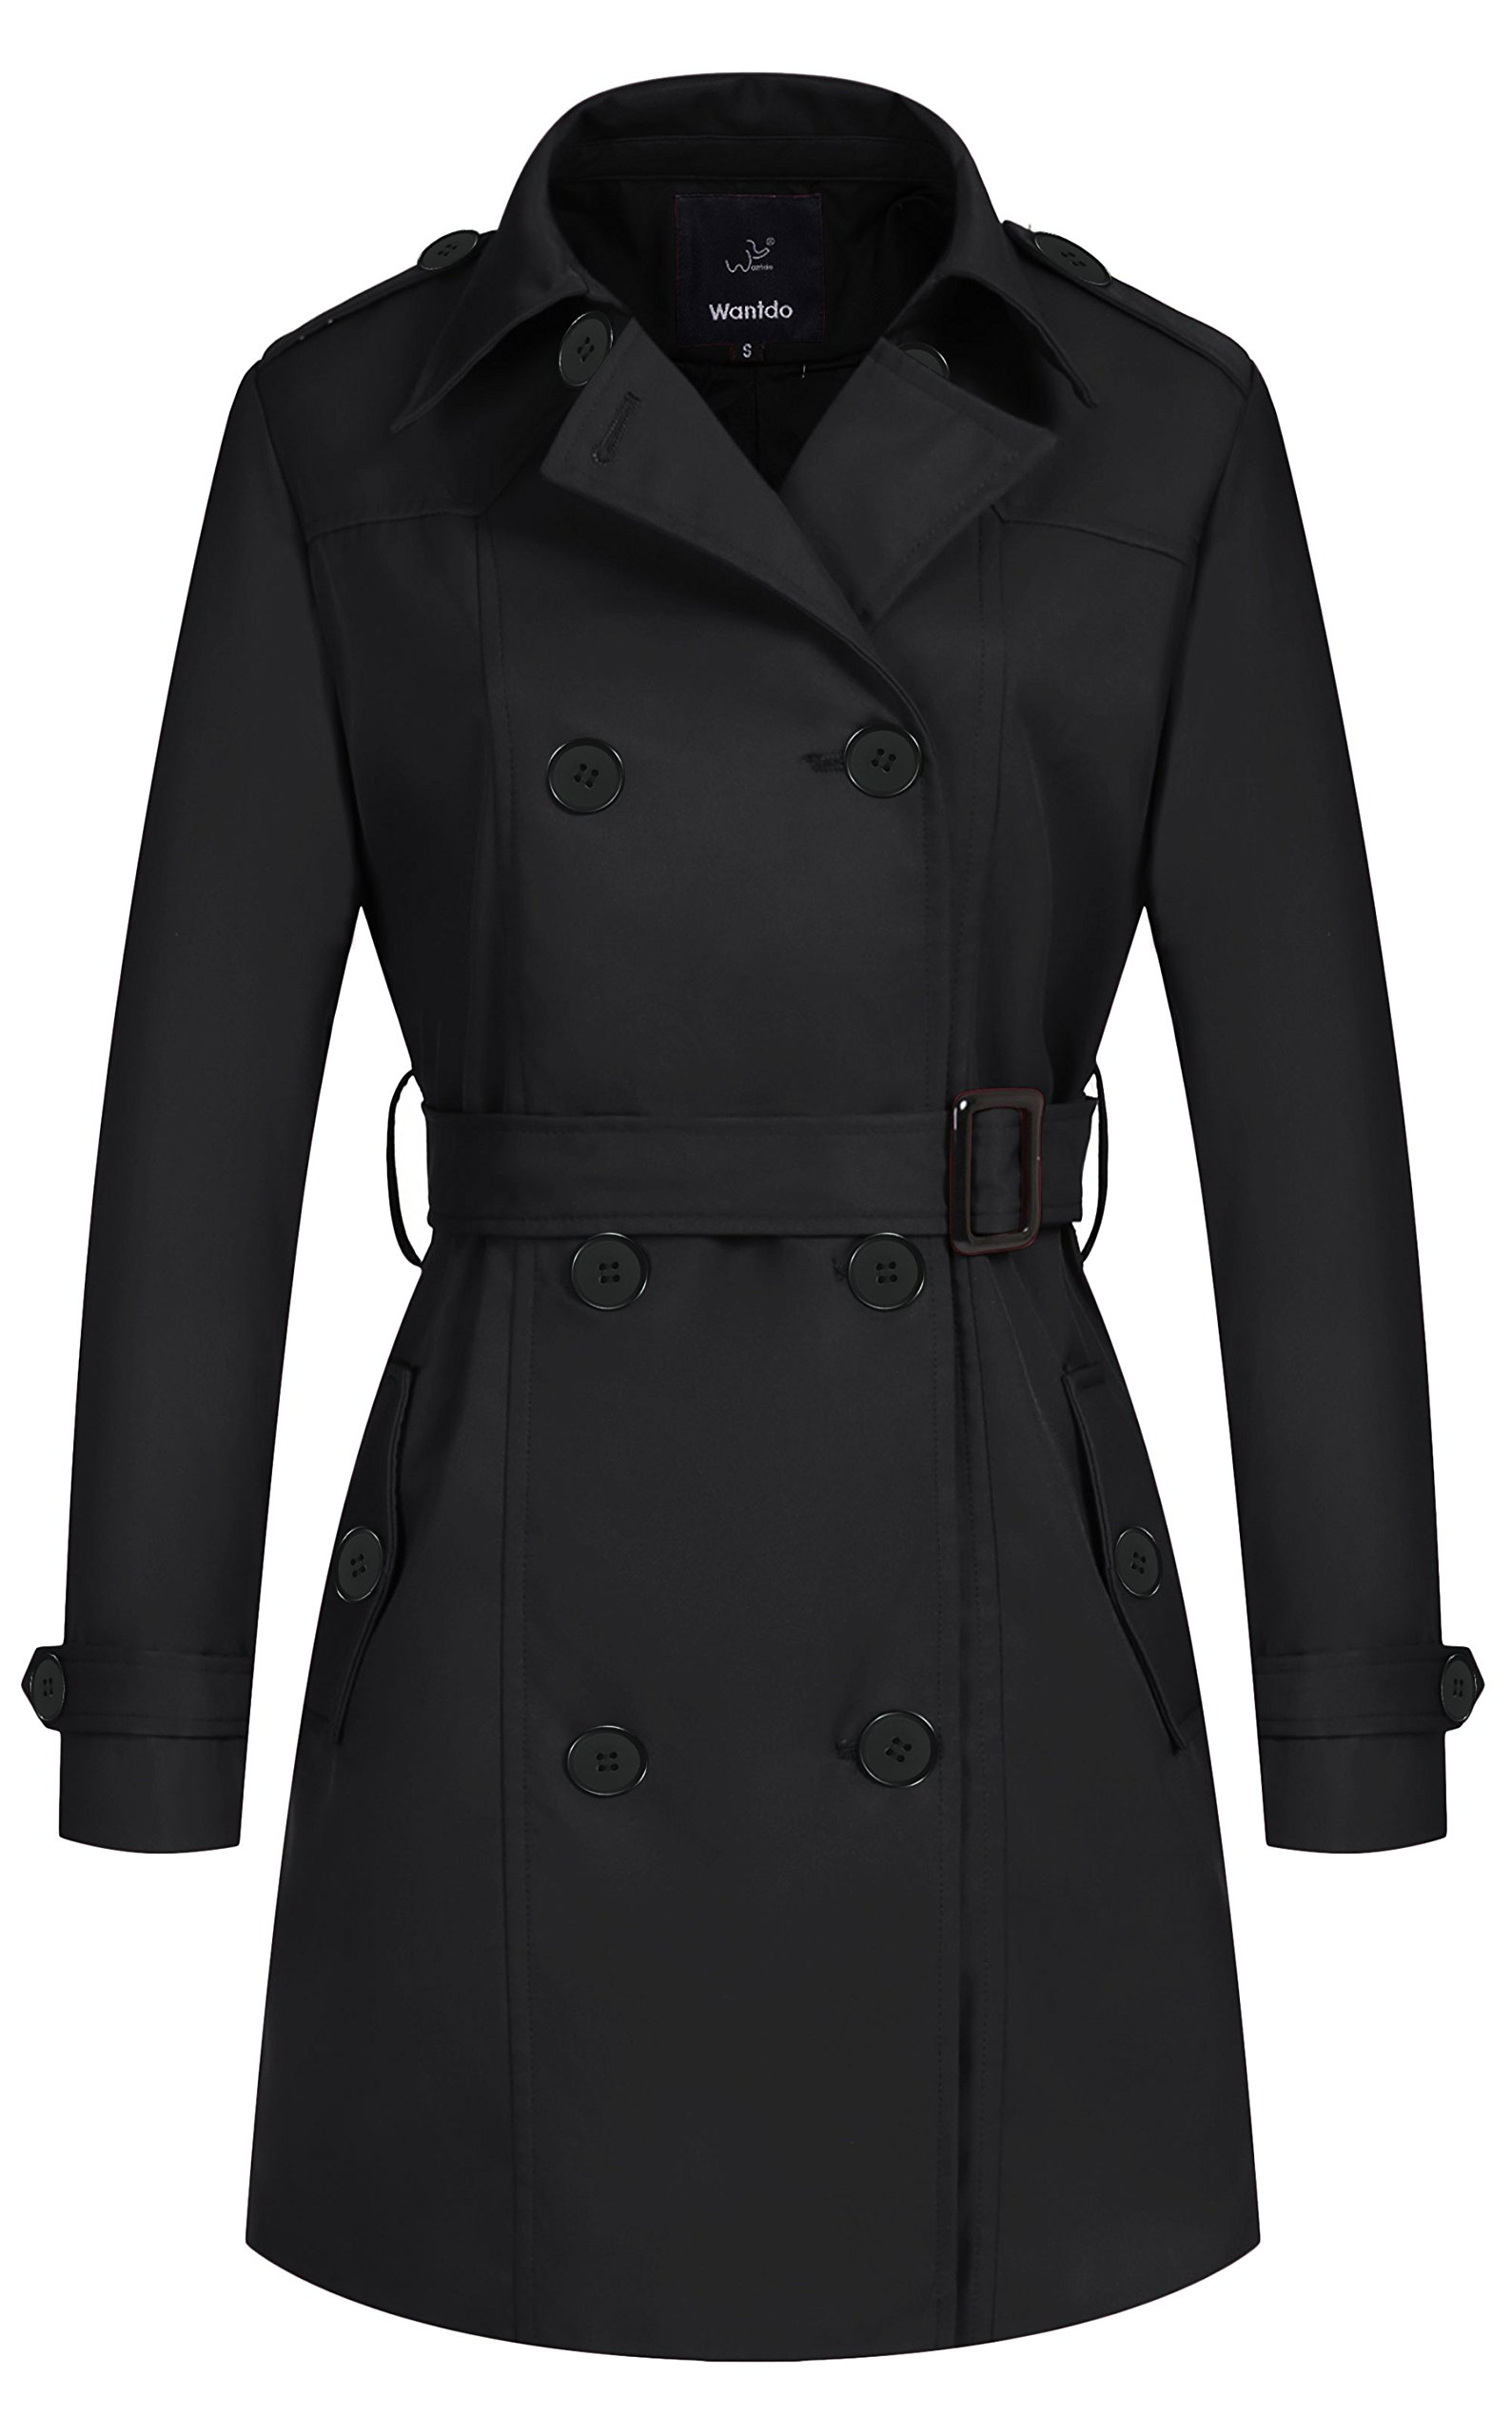 Wantdo Women's Peacoat Long Trench Coat with Belt Black Medium by Wantdo